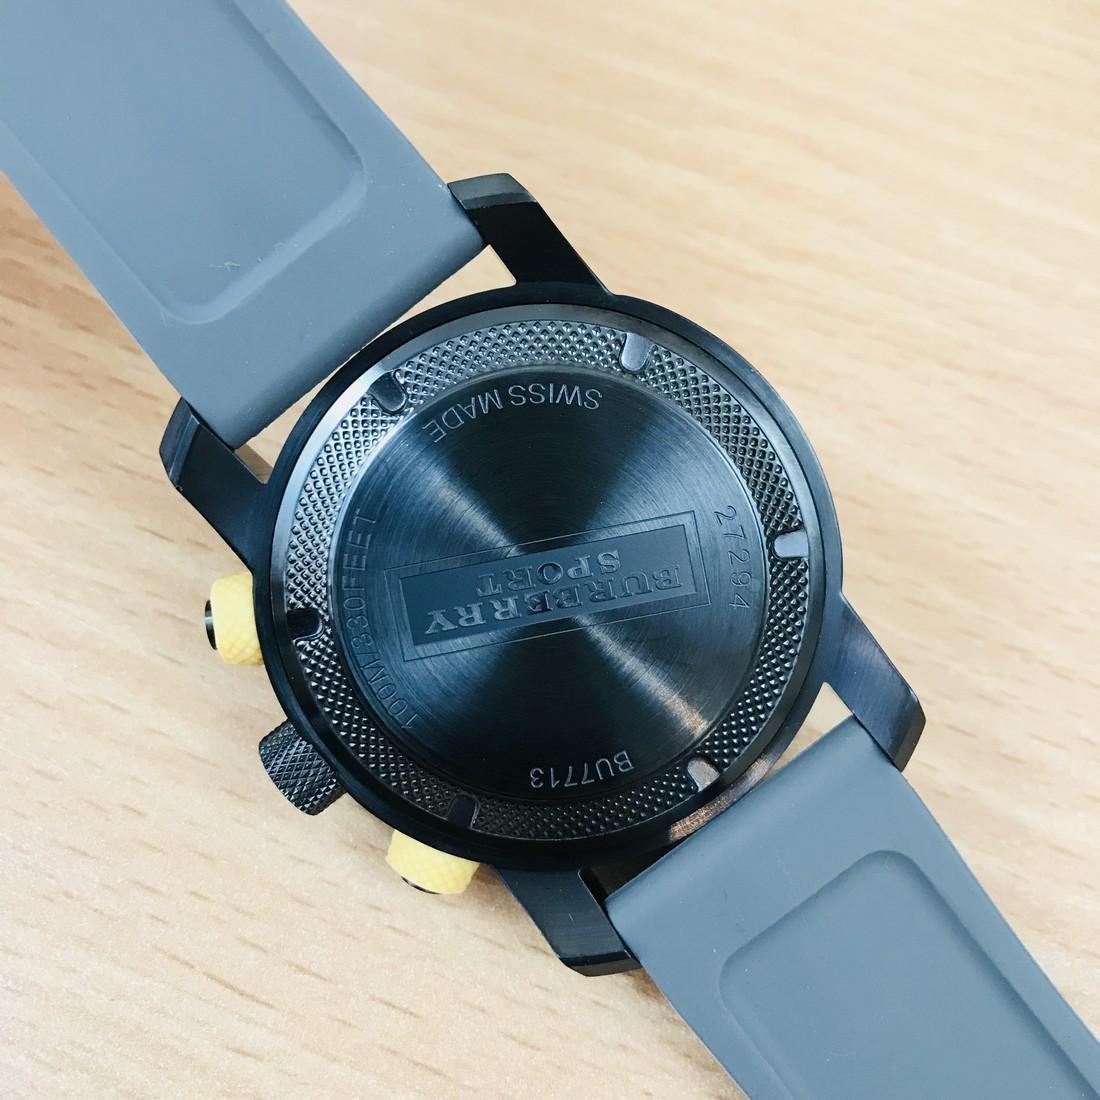 Burberry Endurance Swiss Made Men's Chronograph Watch - 9